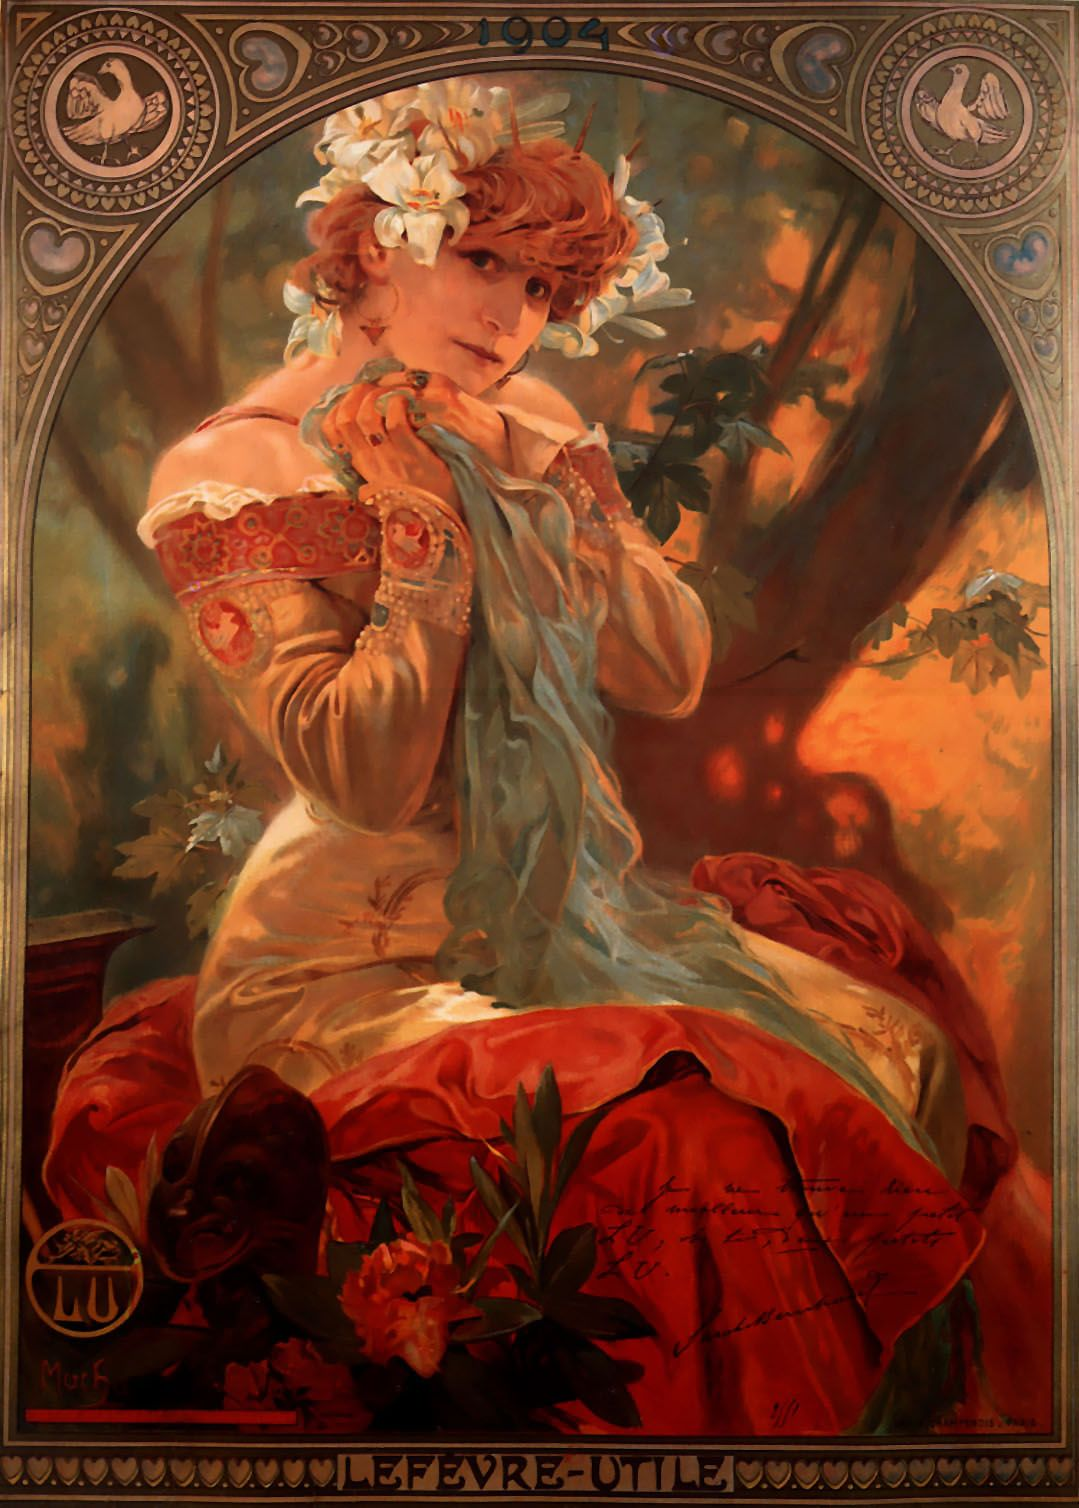 Lefevre Utile 1903, Alphonse Mucha